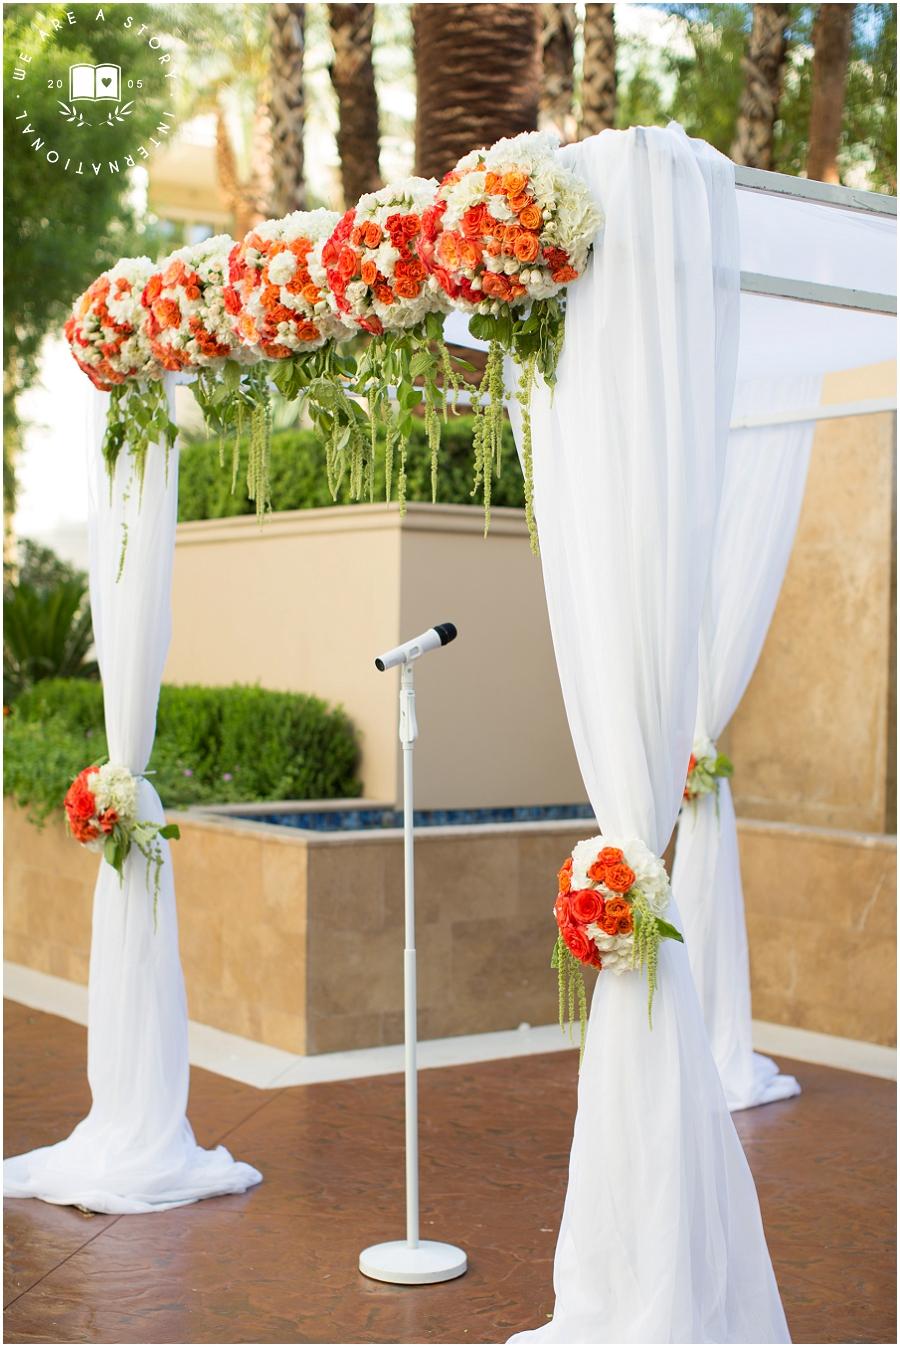 Four Seasons wedding photographer Las Vegas _ We Are A Story wedding photographer_2479.jpg